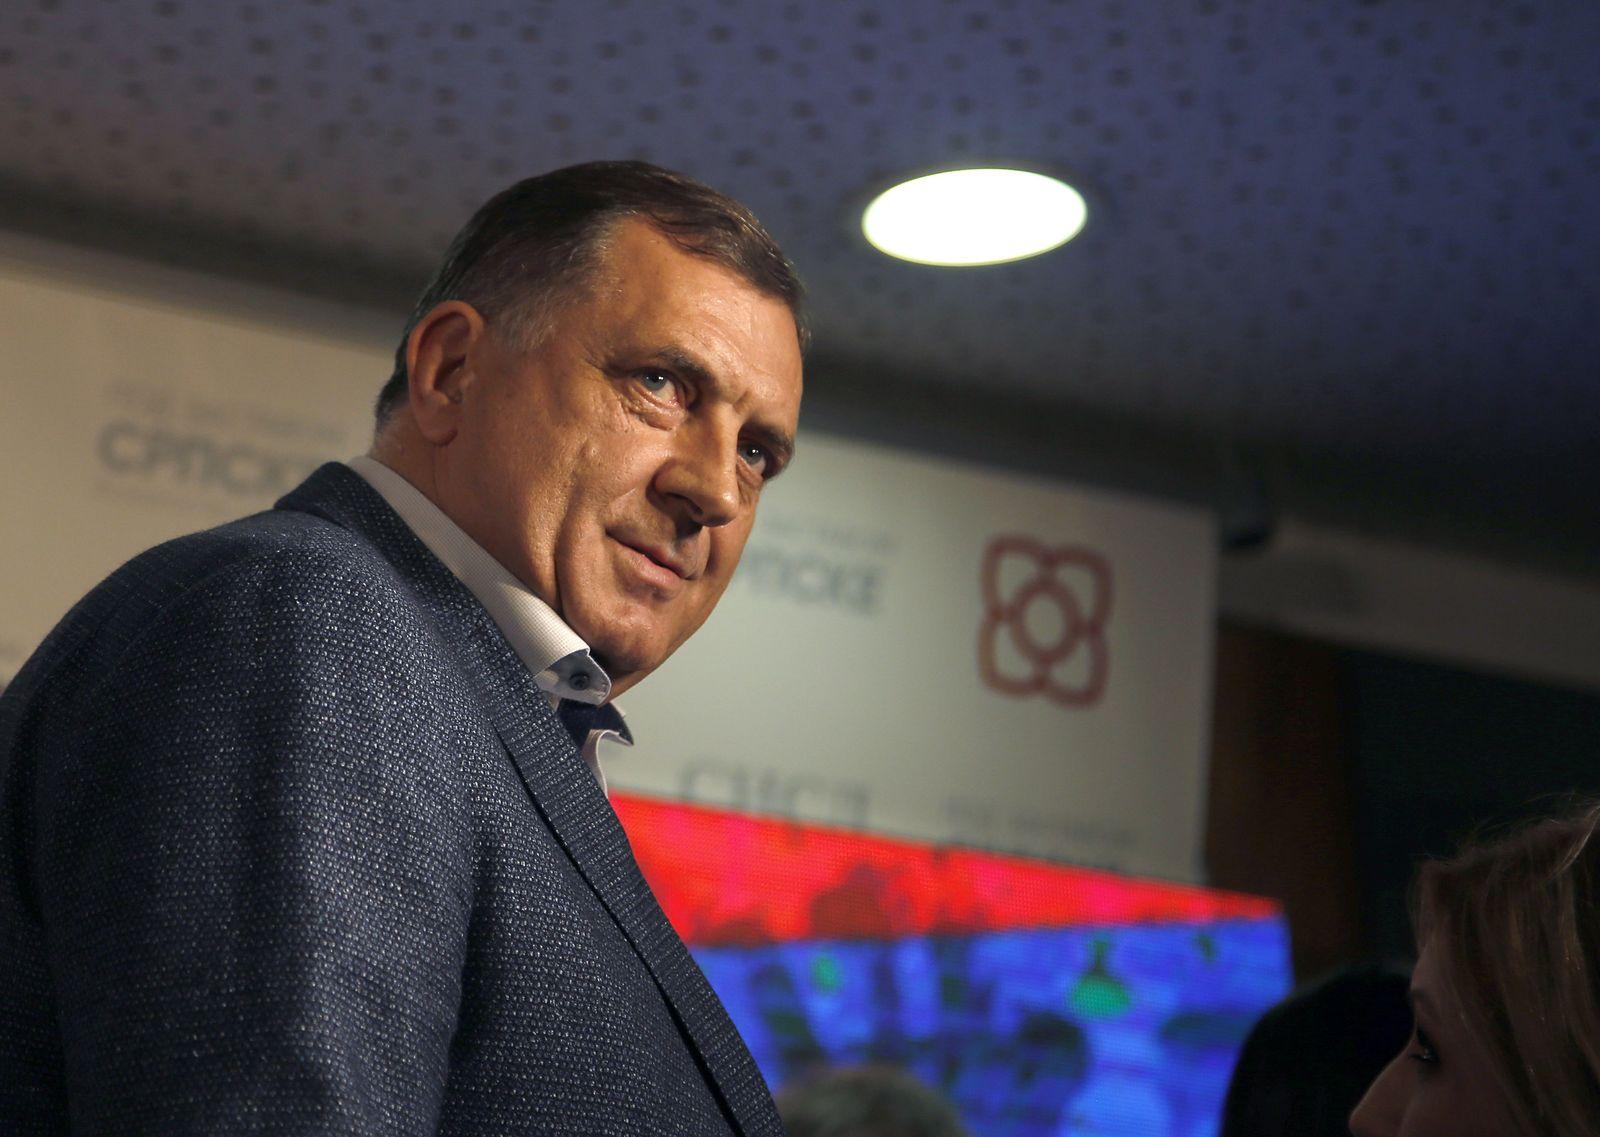 Milorad Dodic